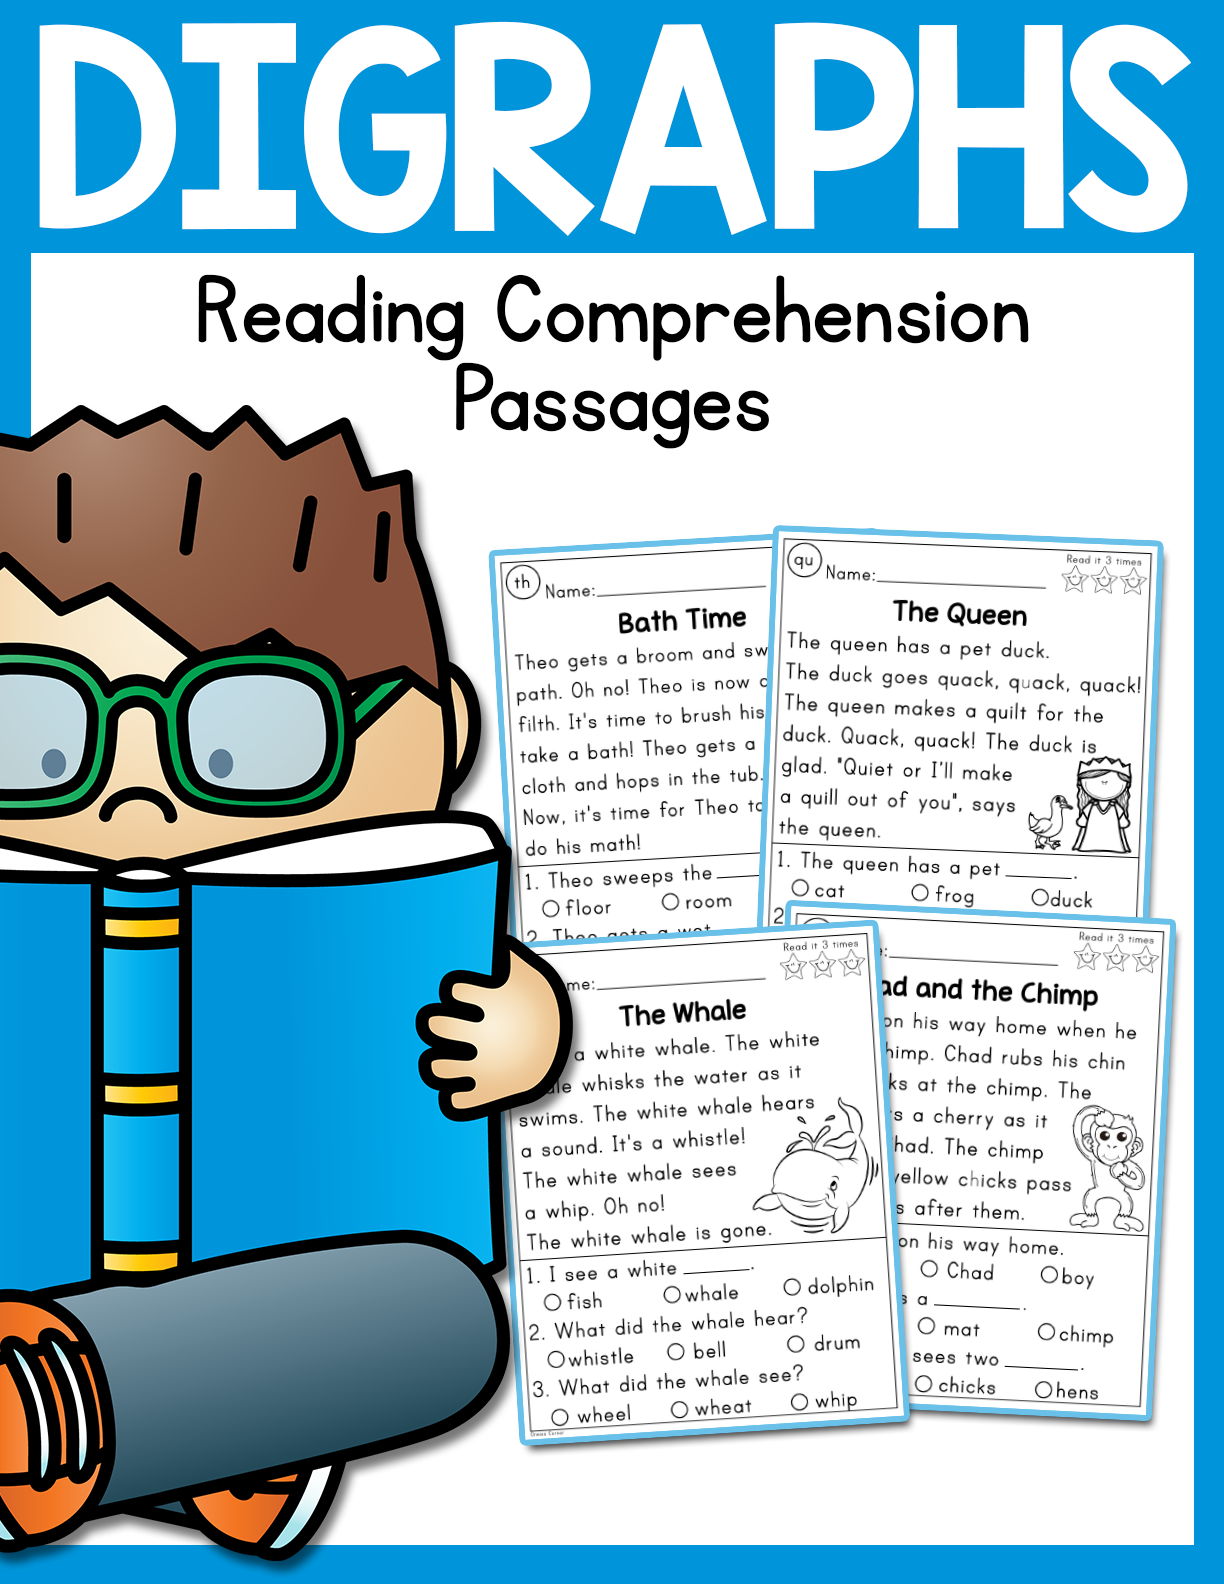 - Digraphs Reading Comprehension Passages - Madebyteachers